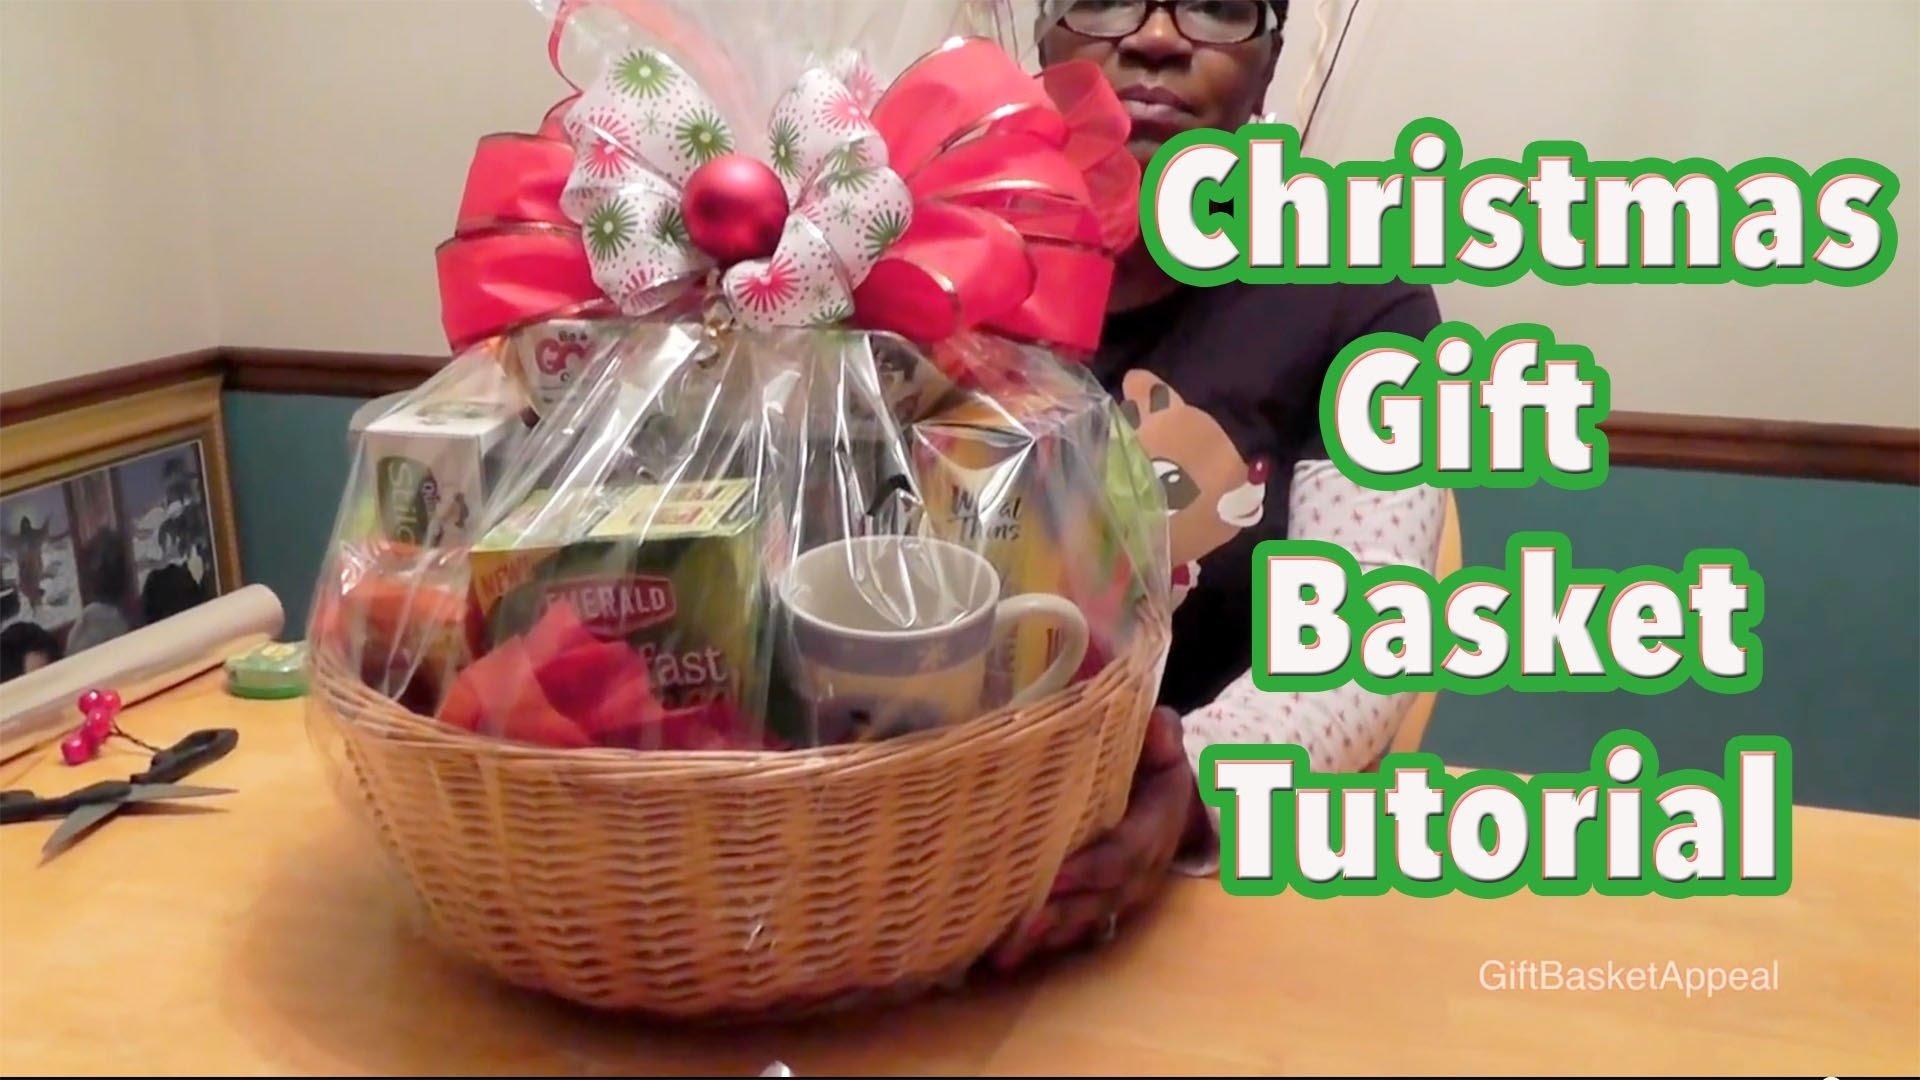 10 Great Homemade Holiday Gift Basket Ideas diy gift basket tutorial christmas gift basket giftbasketappeal 3 2020